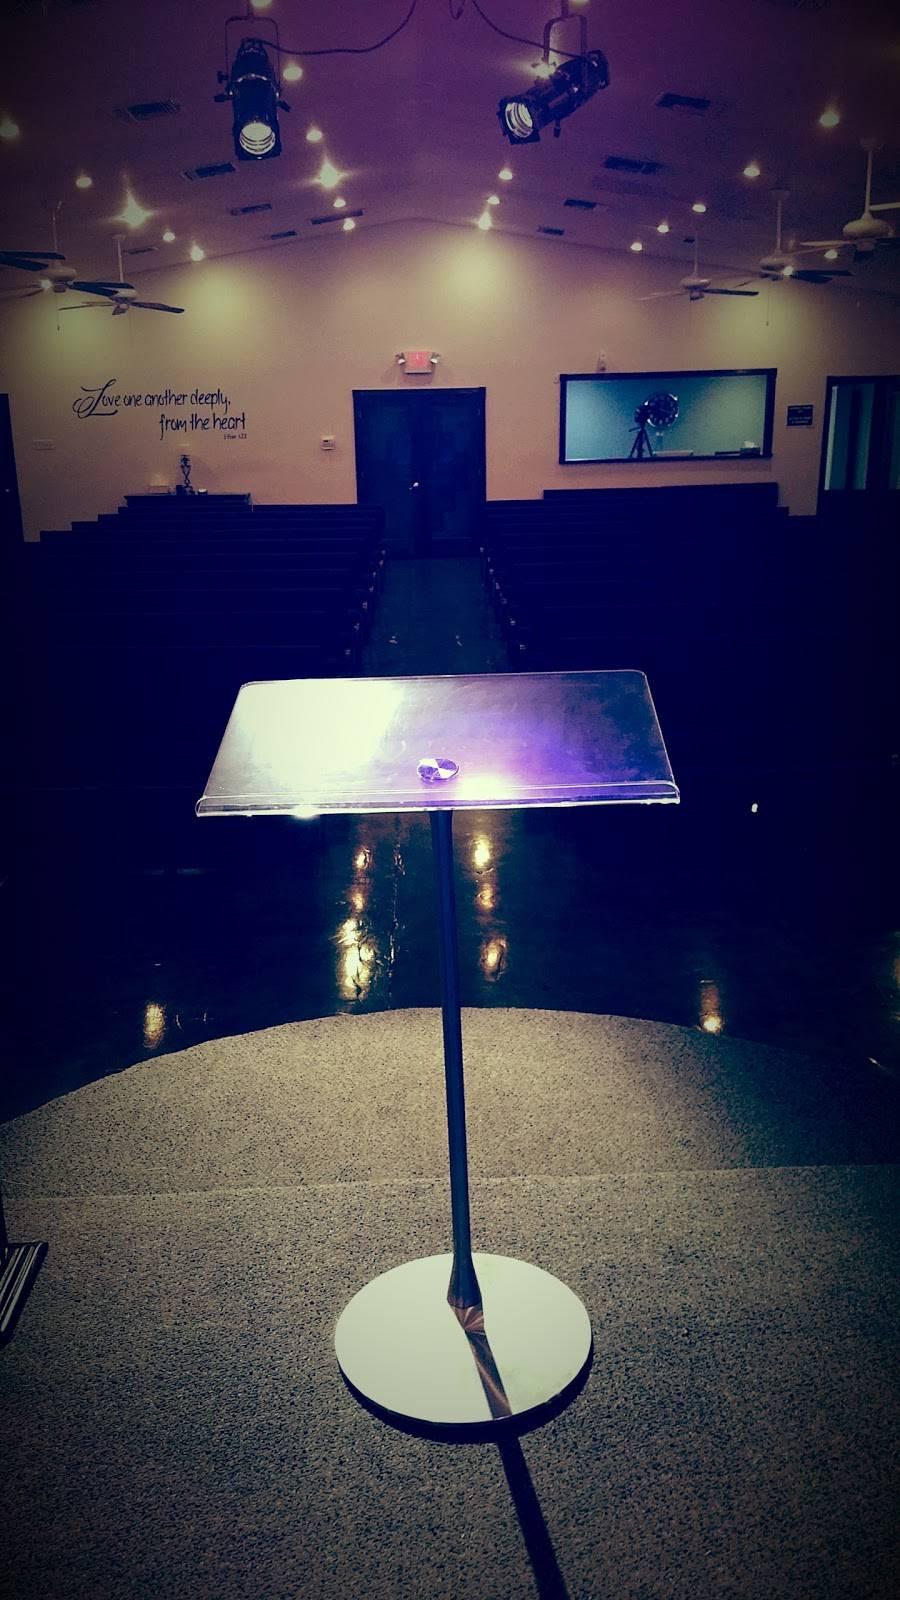 Newlife Covenant Church - church    Photo 5 of 9   Address: 541 E Main St, Avondale, AZ 85323, USA   Phone: (623) 932-1670